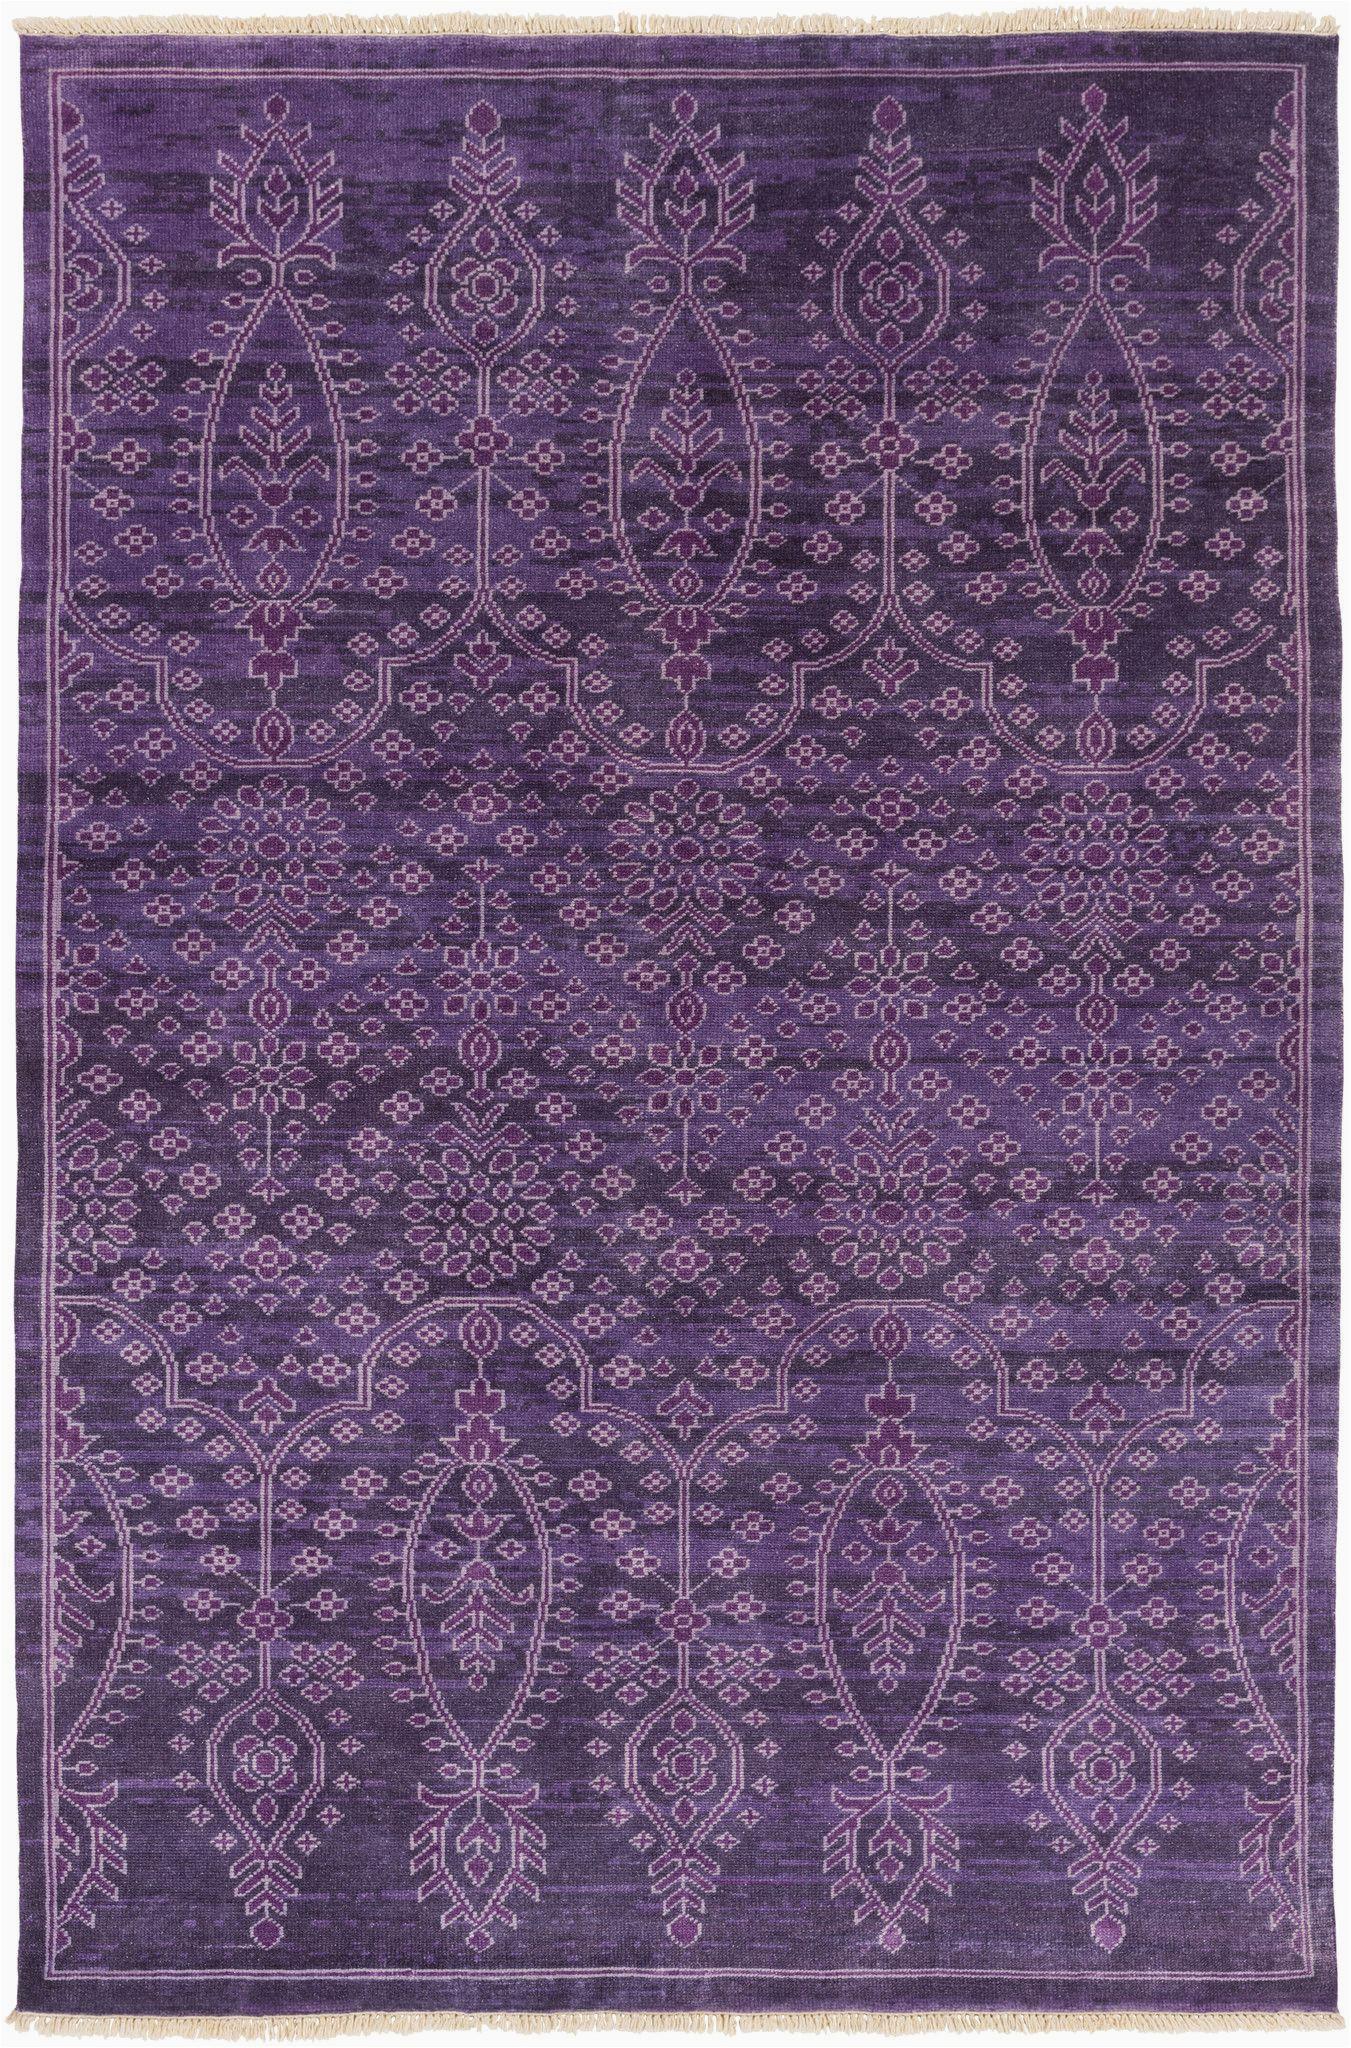 Purple area Rug for Bedroom Antique Rug In Purple Design by Surya